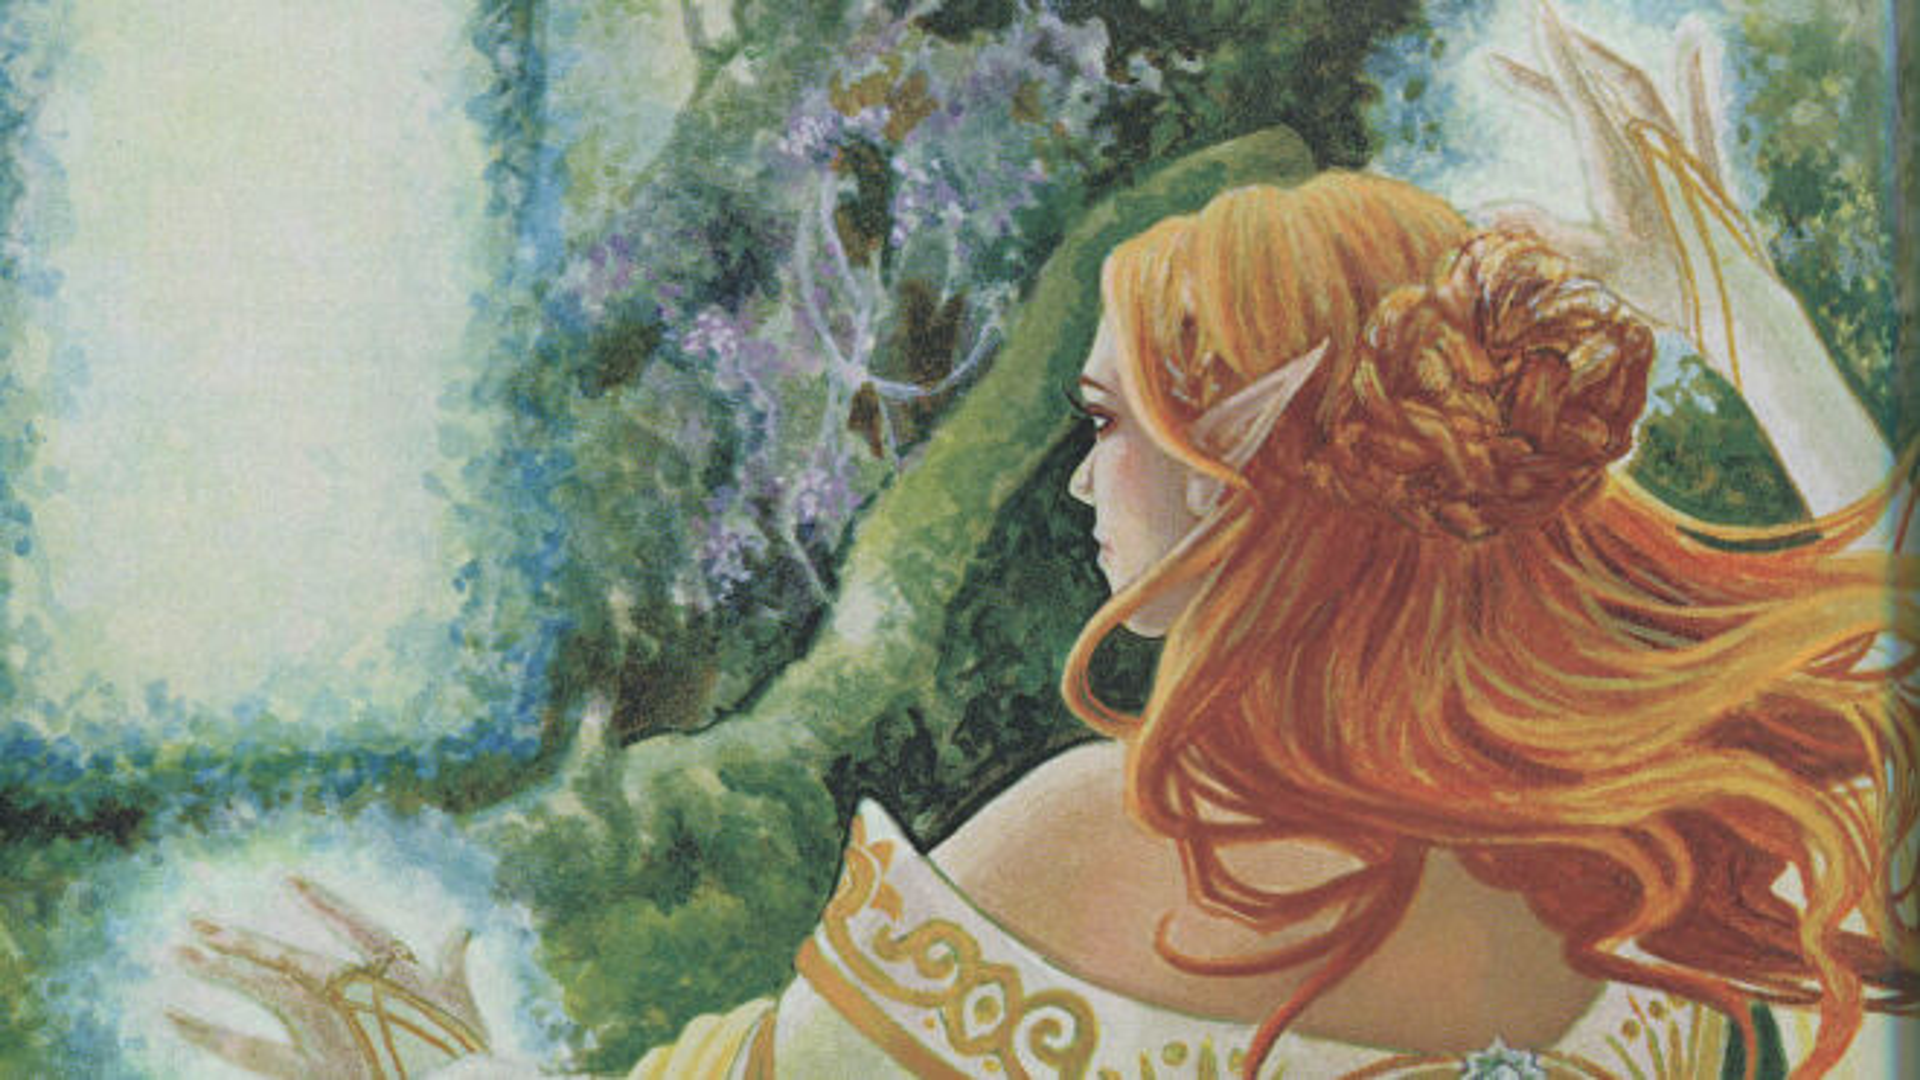 Dungeons & Dragons 5e Players Handbook artwork 13